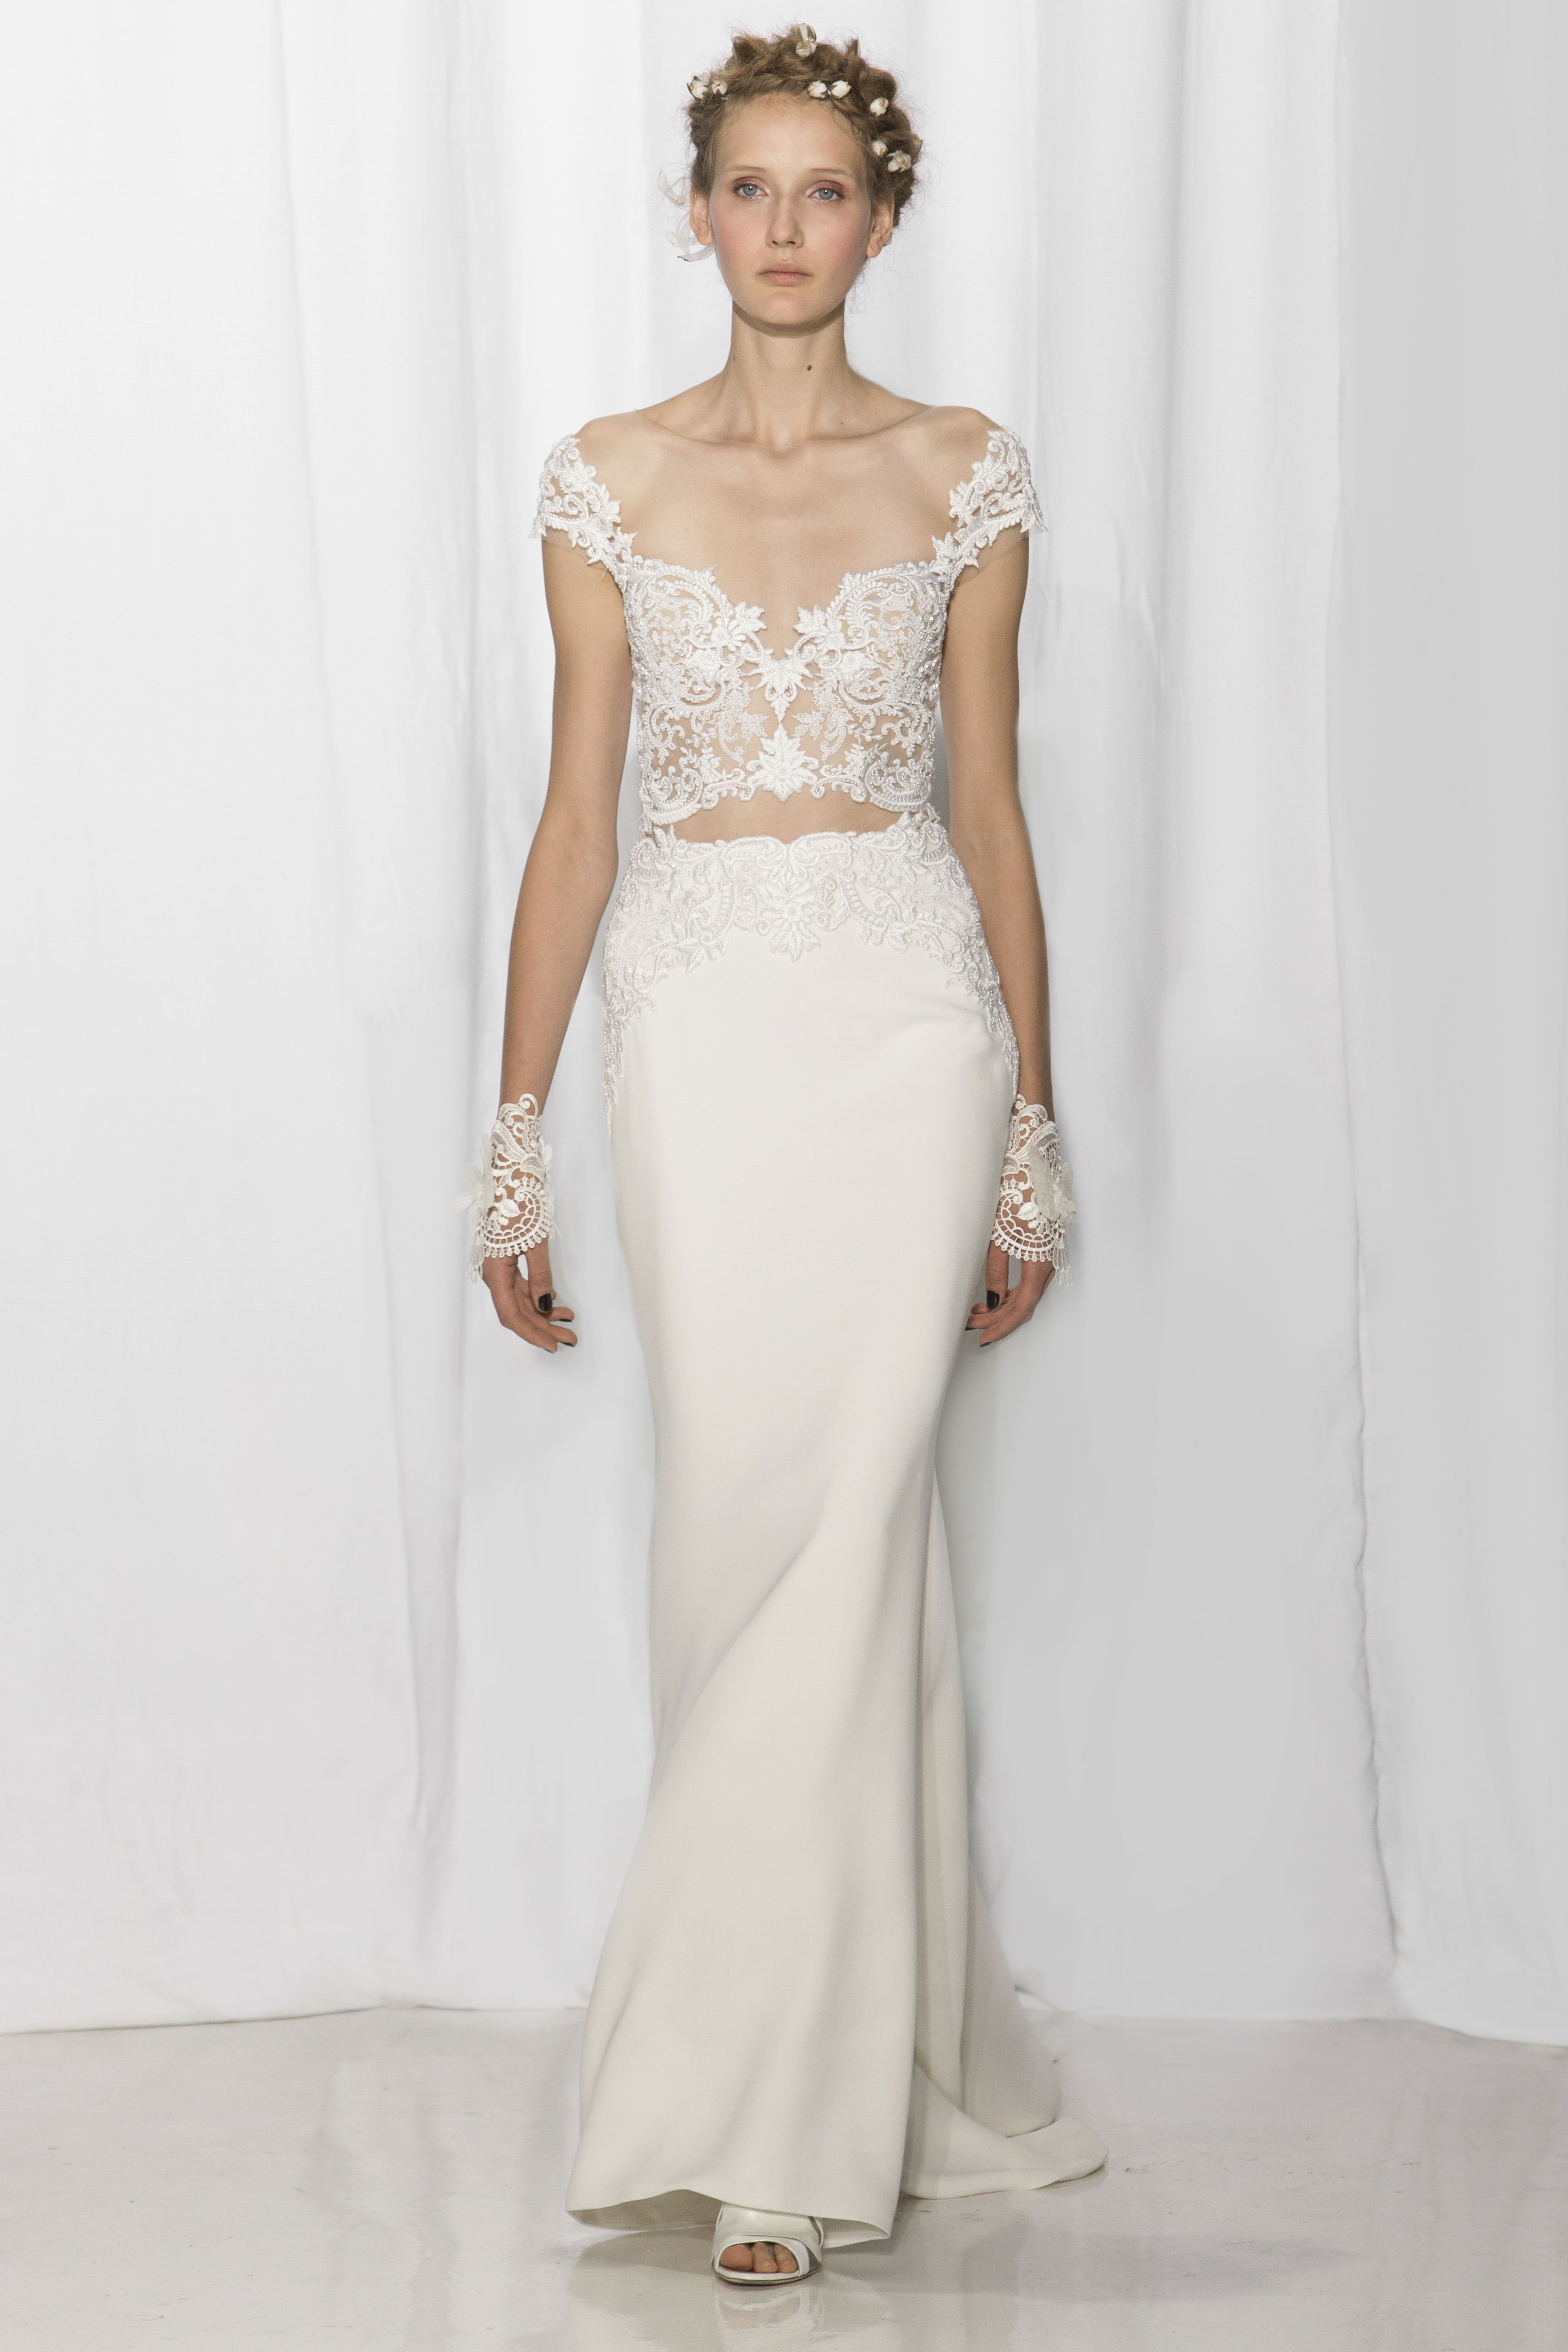 0a4a77974969 Reem Acra - Bridal Collection - Look 12 – Penelope | wedding | Reem ...